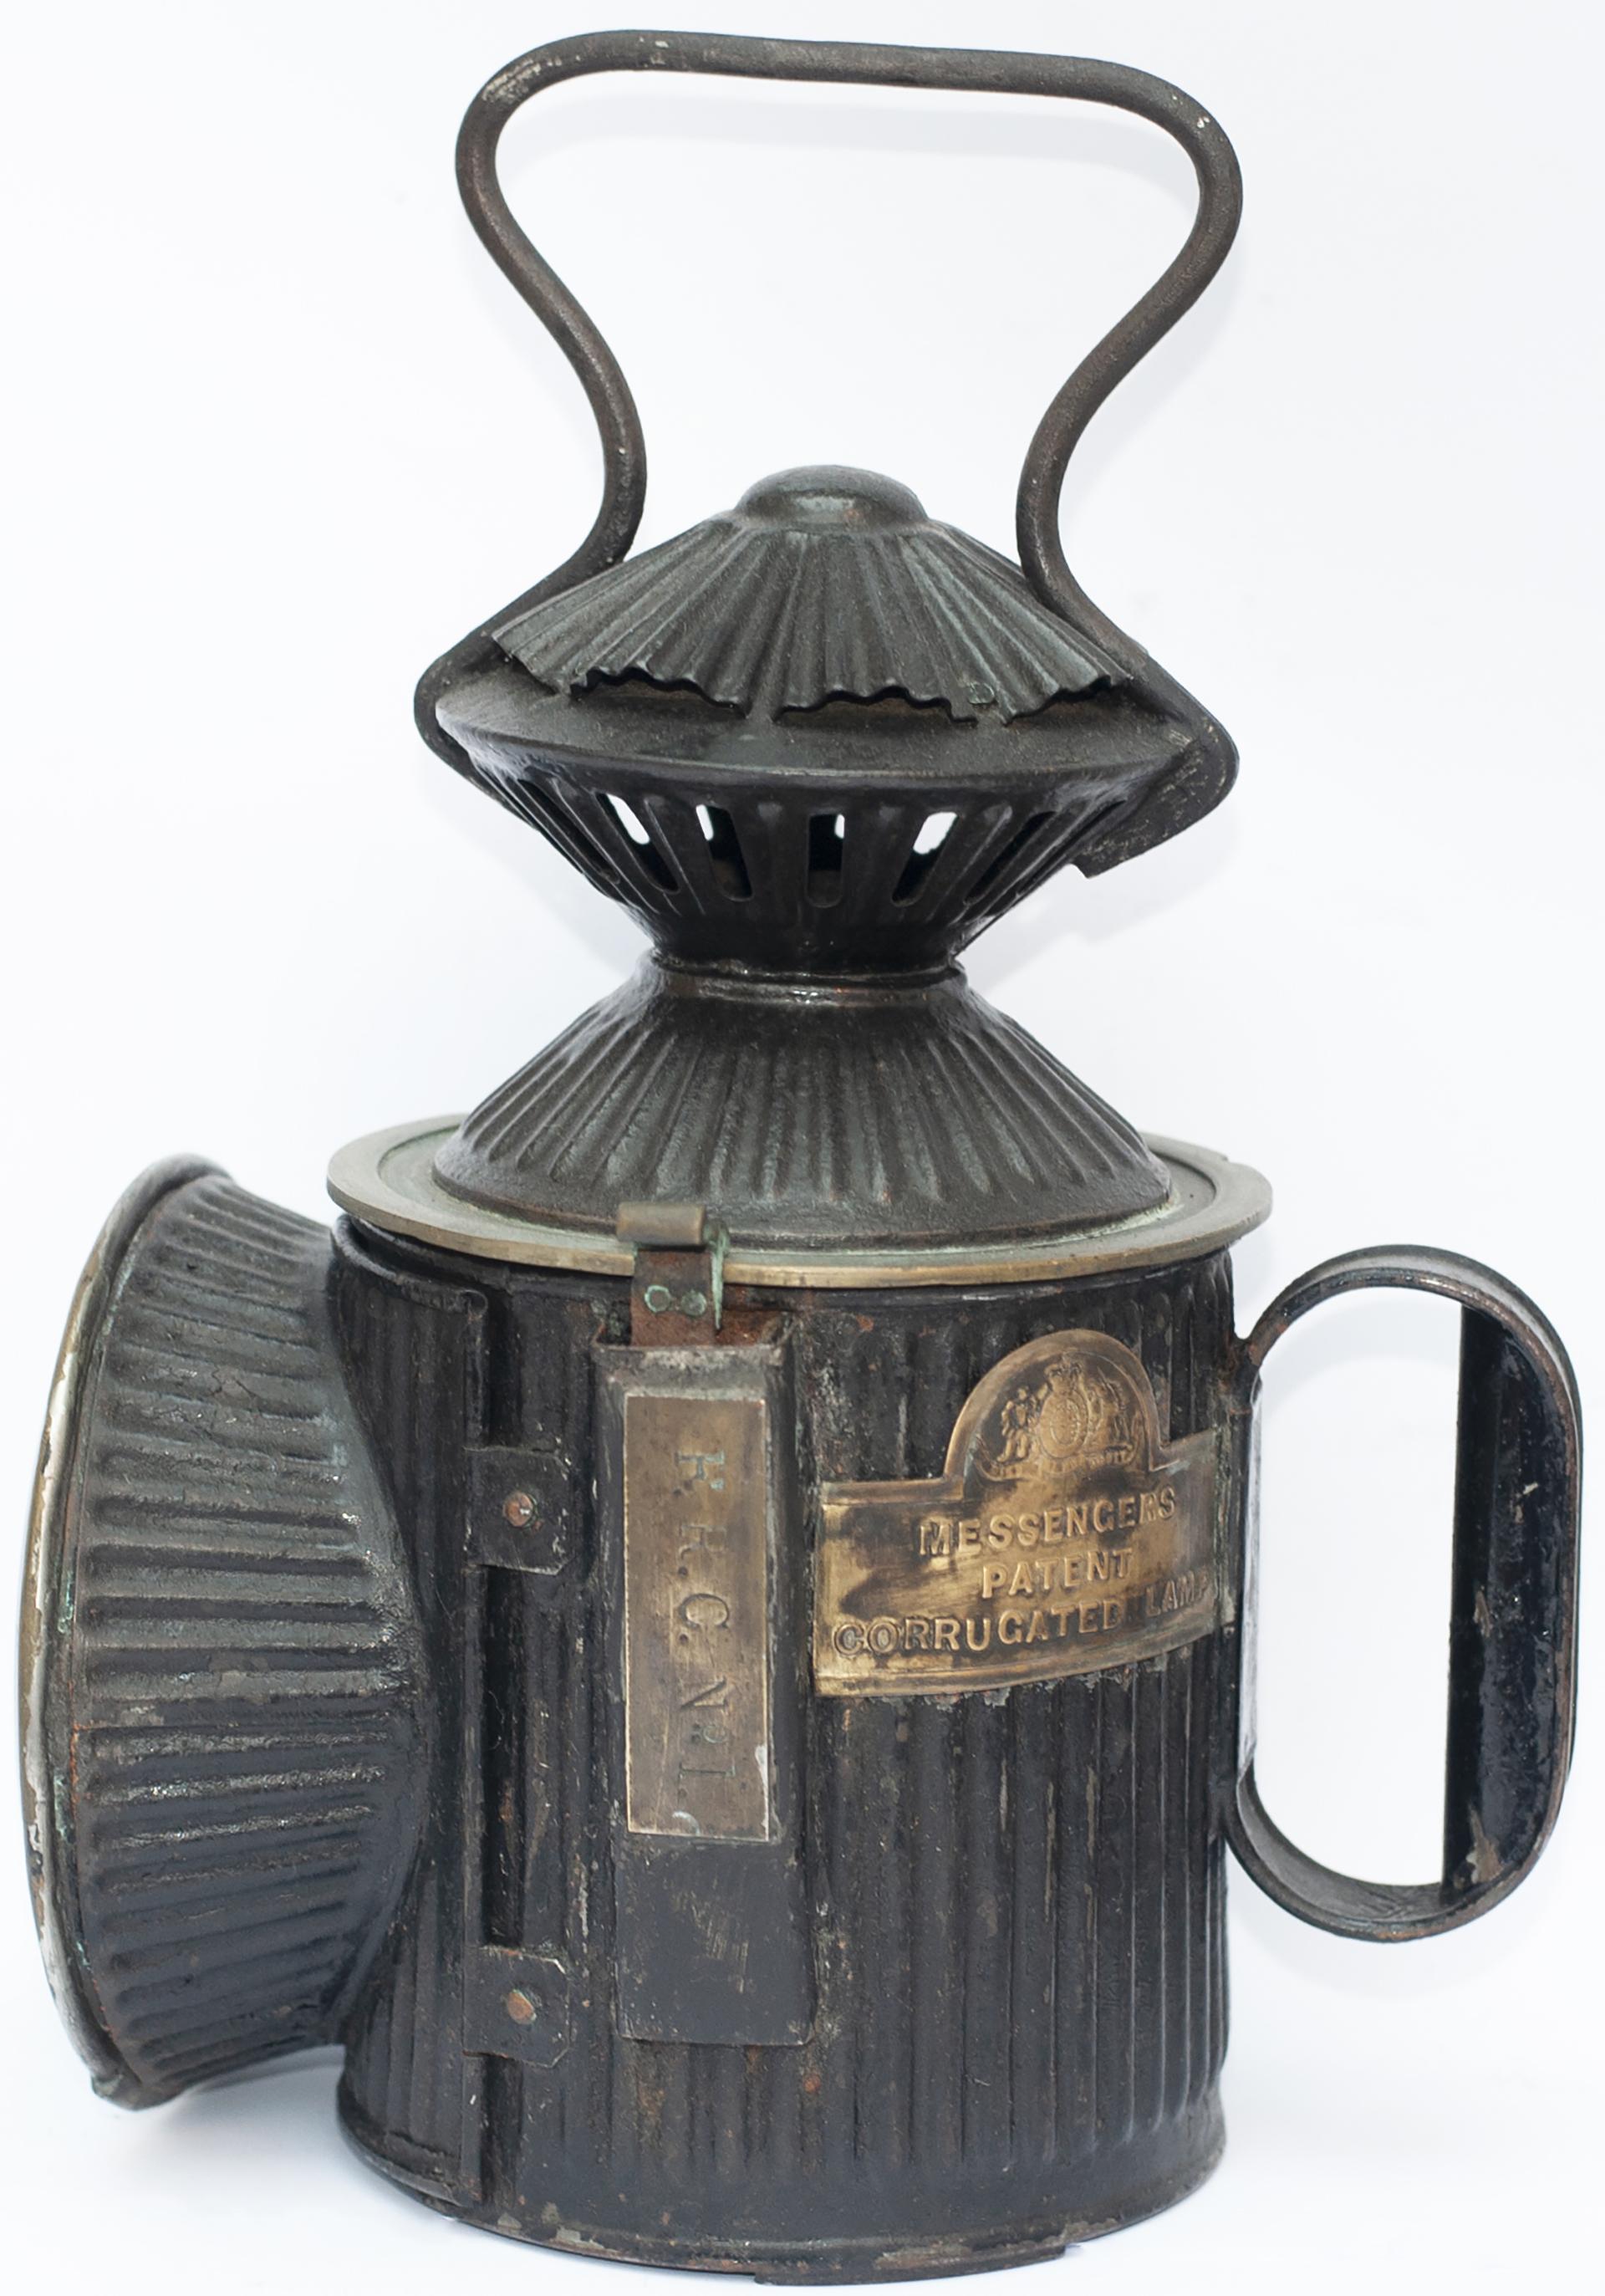 Furness Railway 3 Aspect Hand Lamp Brass Plated On